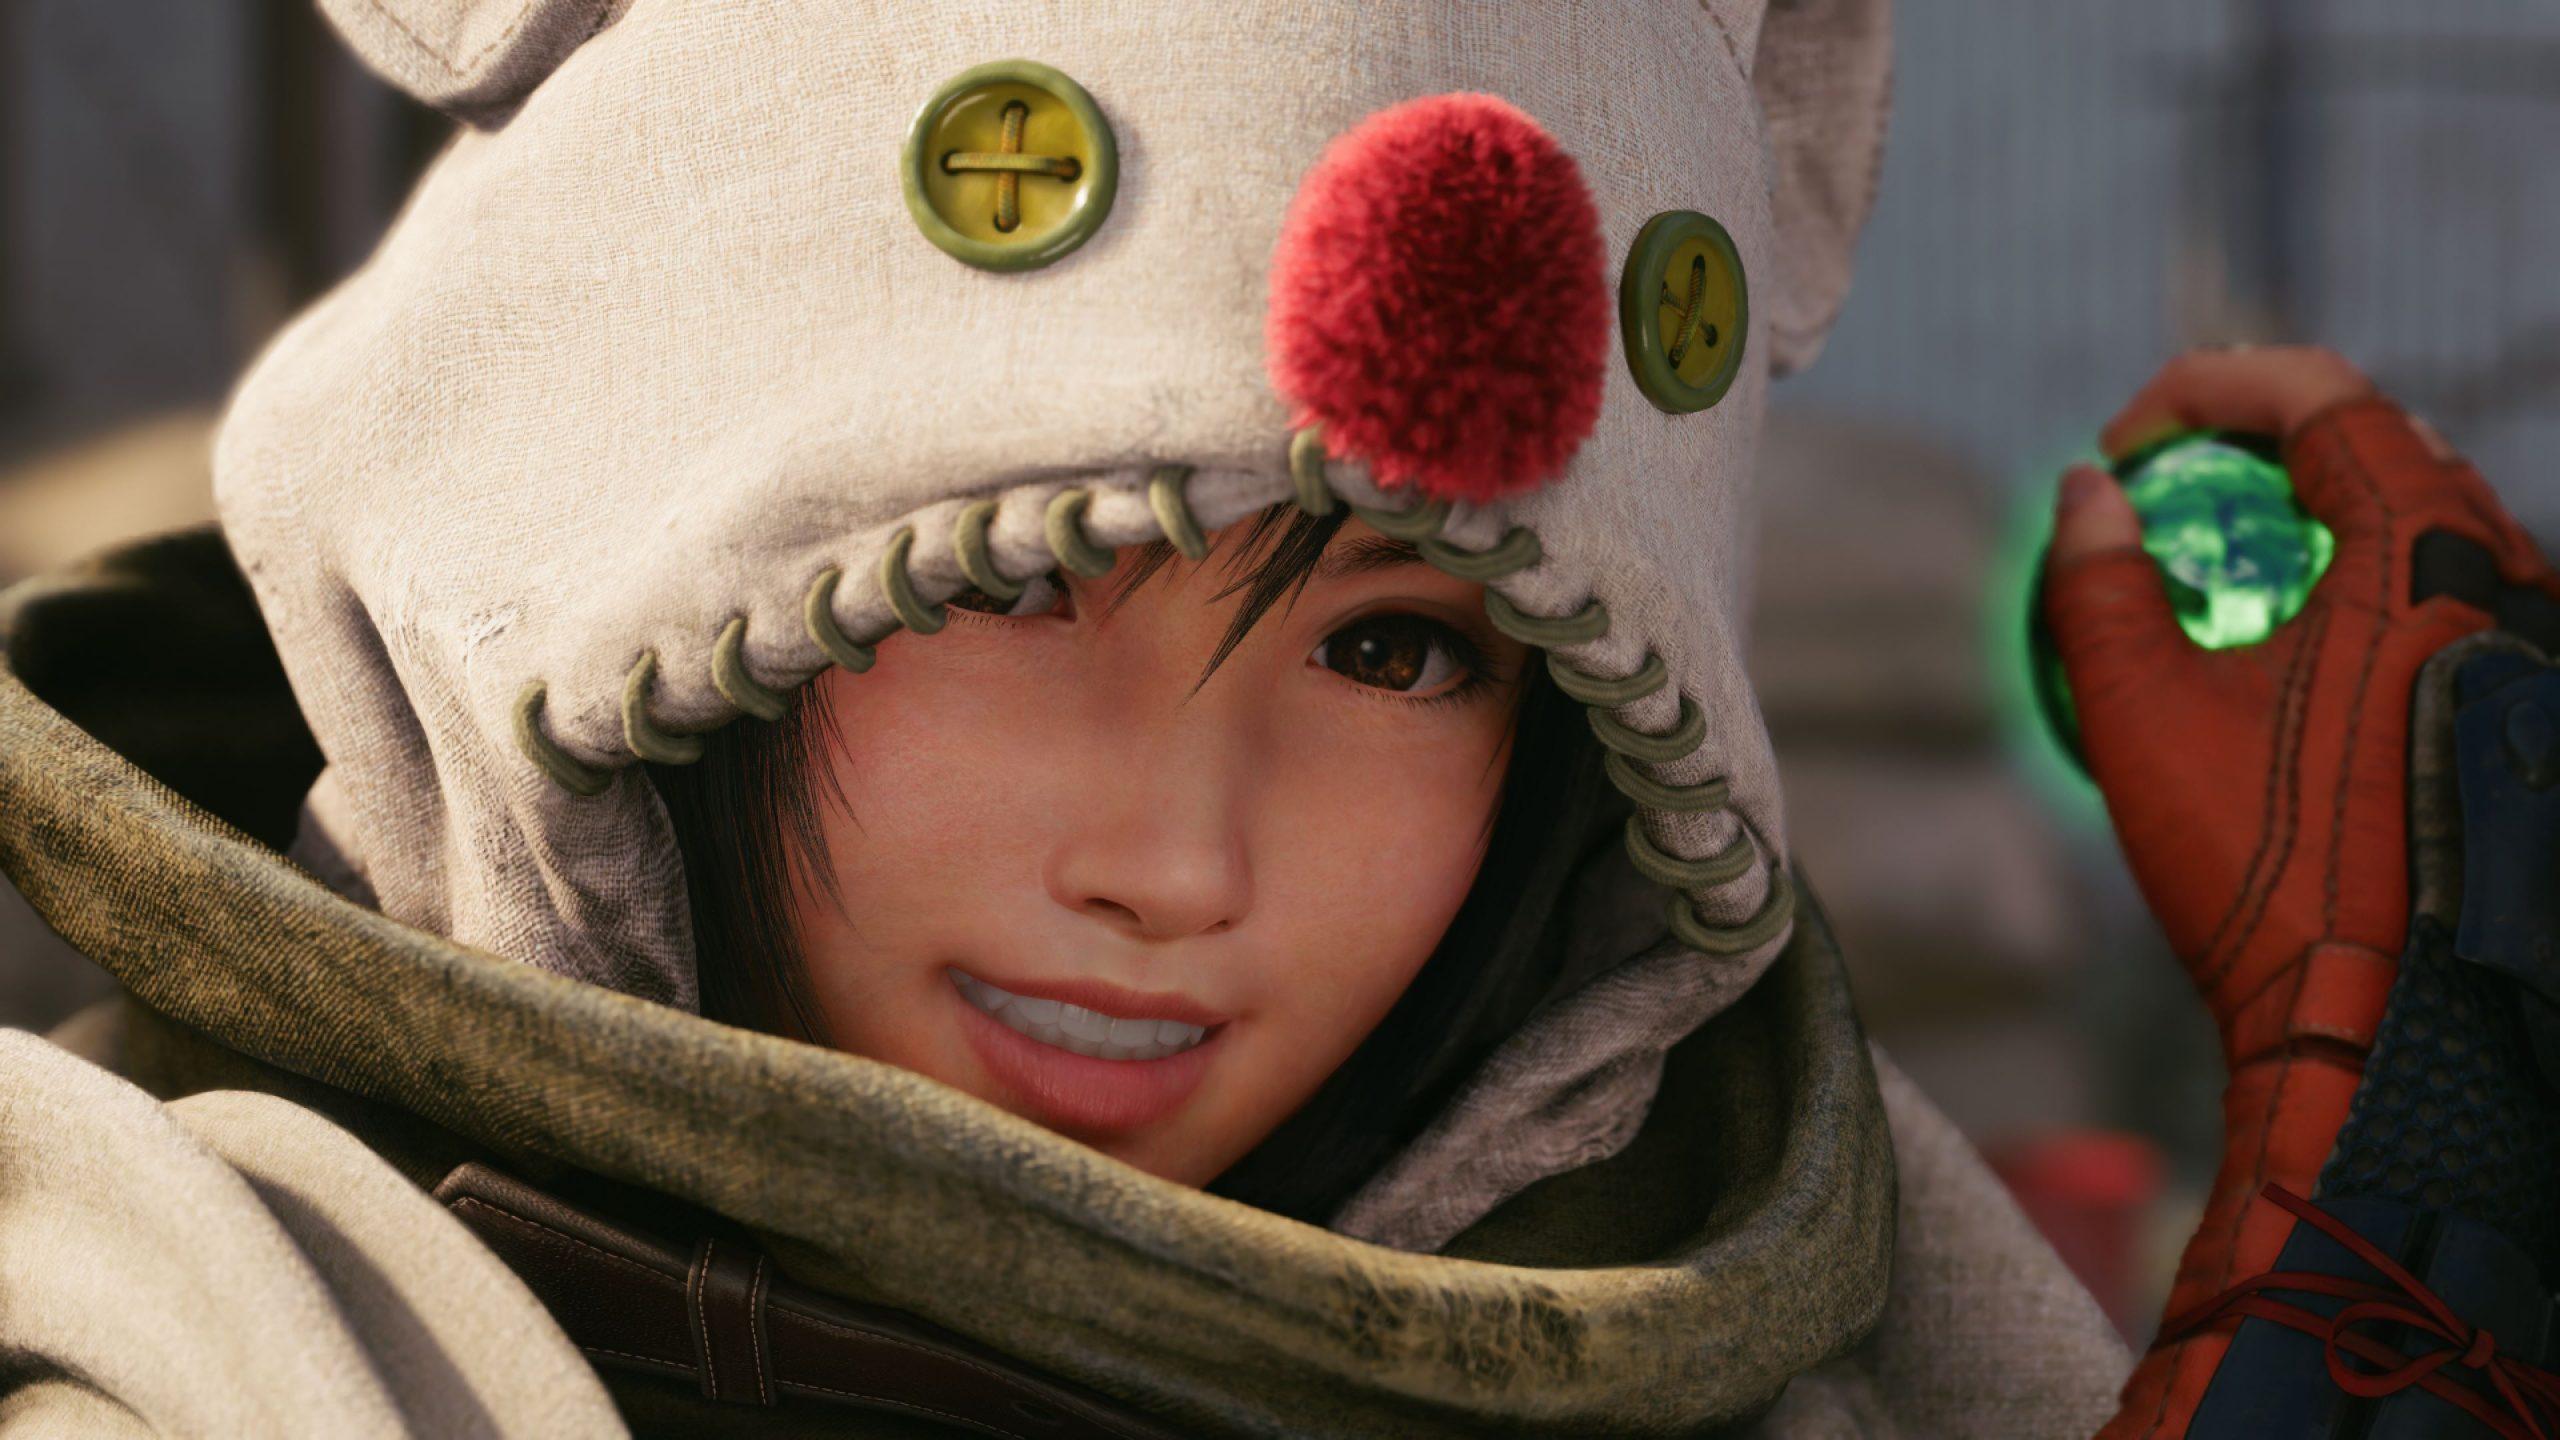 Final Fantasy VII Remake Intergrade Closeup of Yuffie dressed as a patchwork moogle.